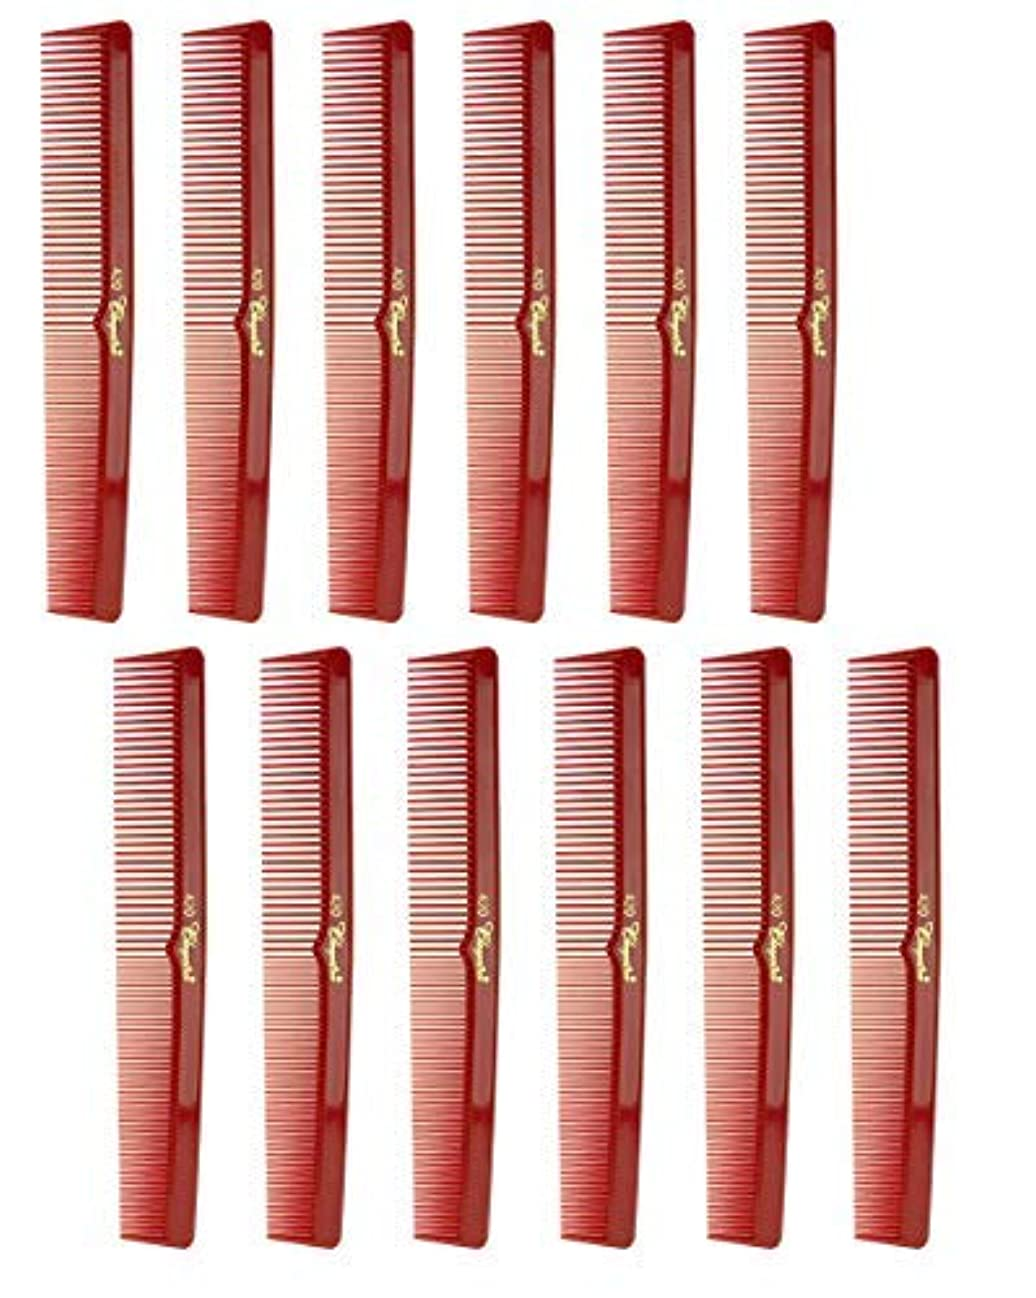 重要性保存雷雨7 Inch Hair Cutting Comb. Barber's & Hairstylist Combs. Red. 1 DZ. [並行輸入品]